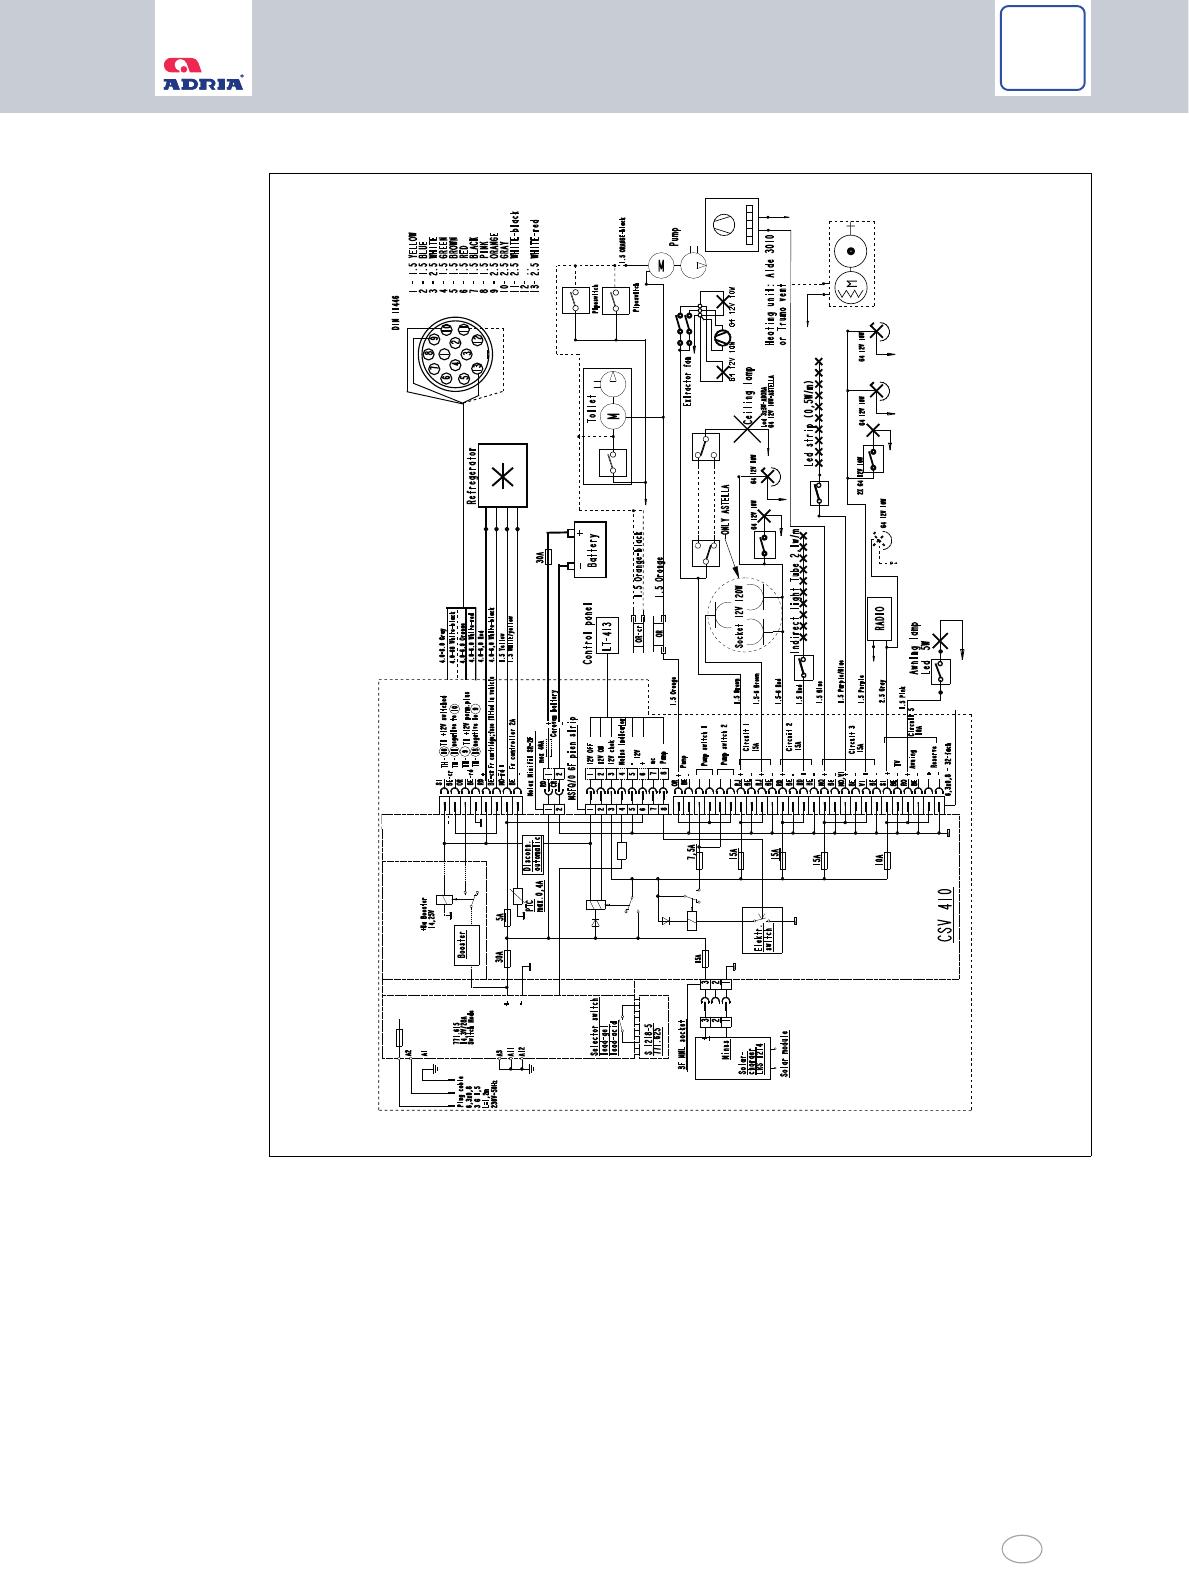 Adria Caravan Wiring Diagram -1995 F150 Stock Radio Wiring Diagram |  Begeboy Wiring Diagram Source | Adria Caravan Wiring Diagram |  | Begeboy Wiring Diagram Source